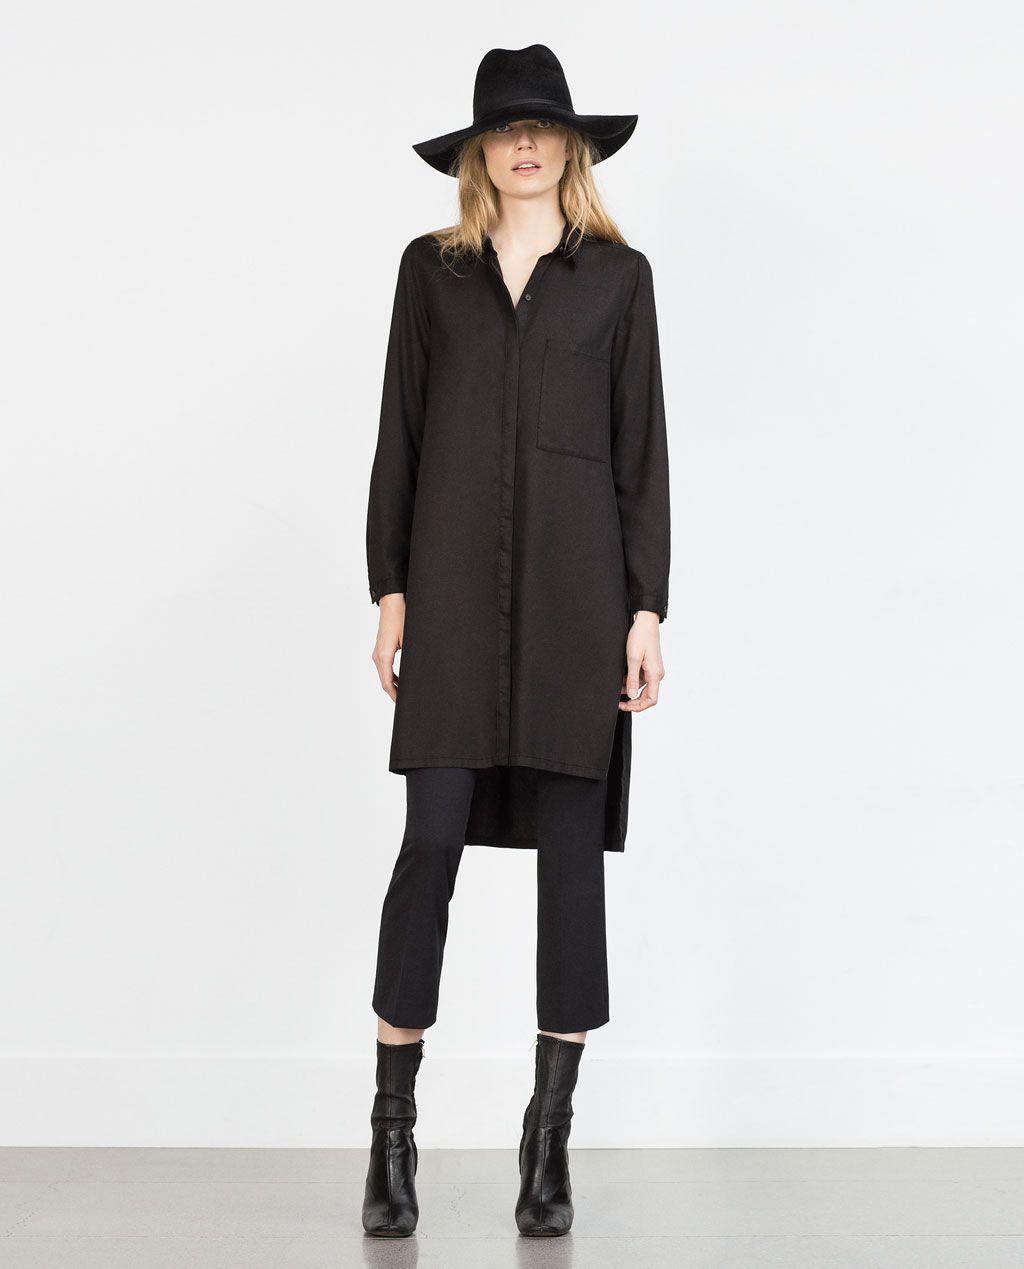 ZARA - WOMAN - LONG SHIRT - long black shirt, another staple I shockingly don't own!